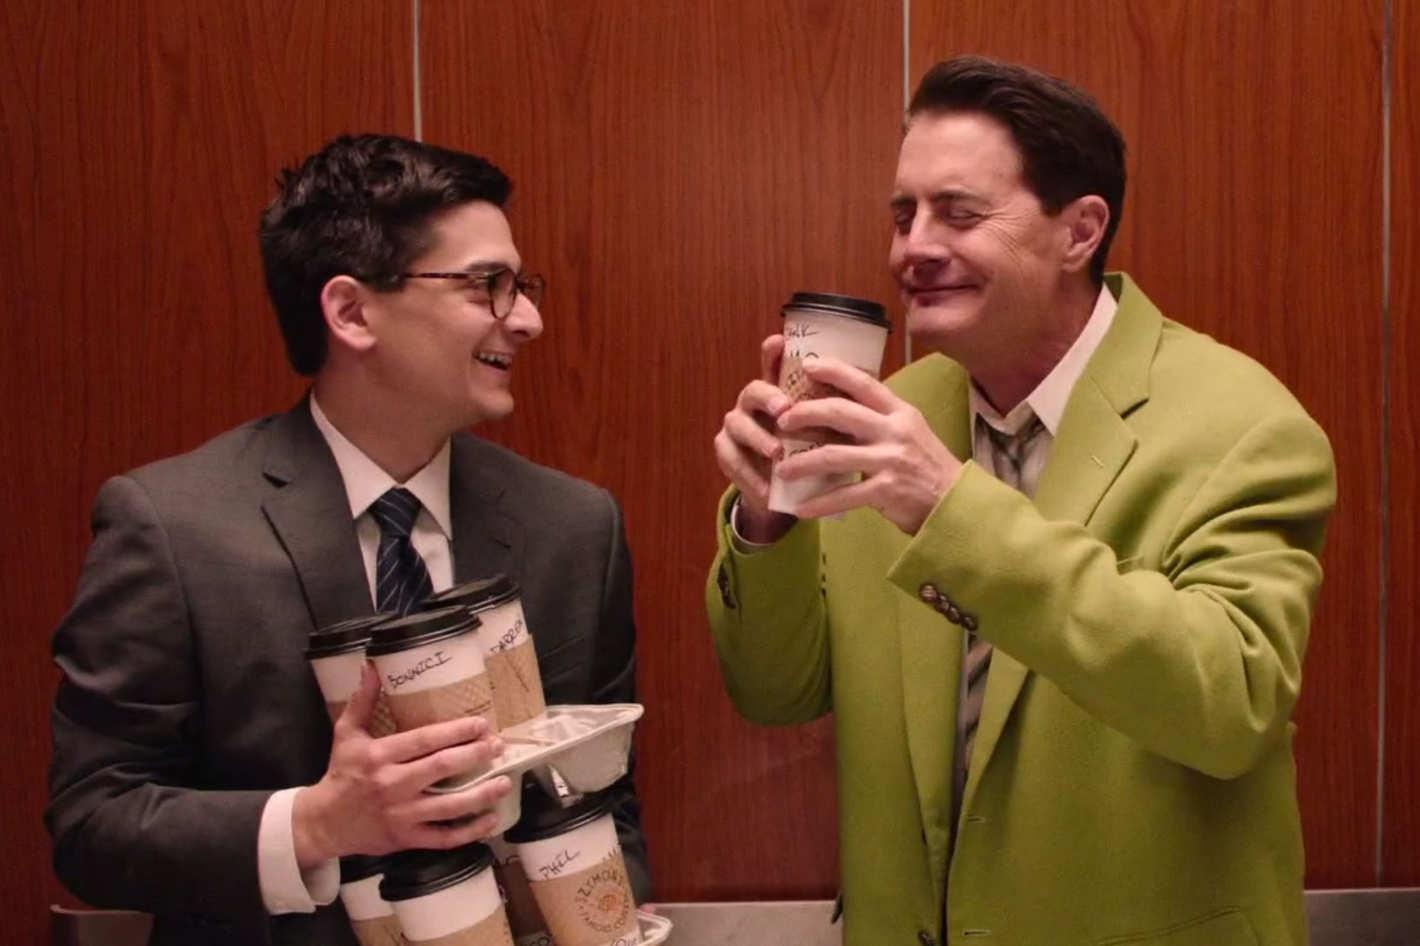 Dougie's Coffee